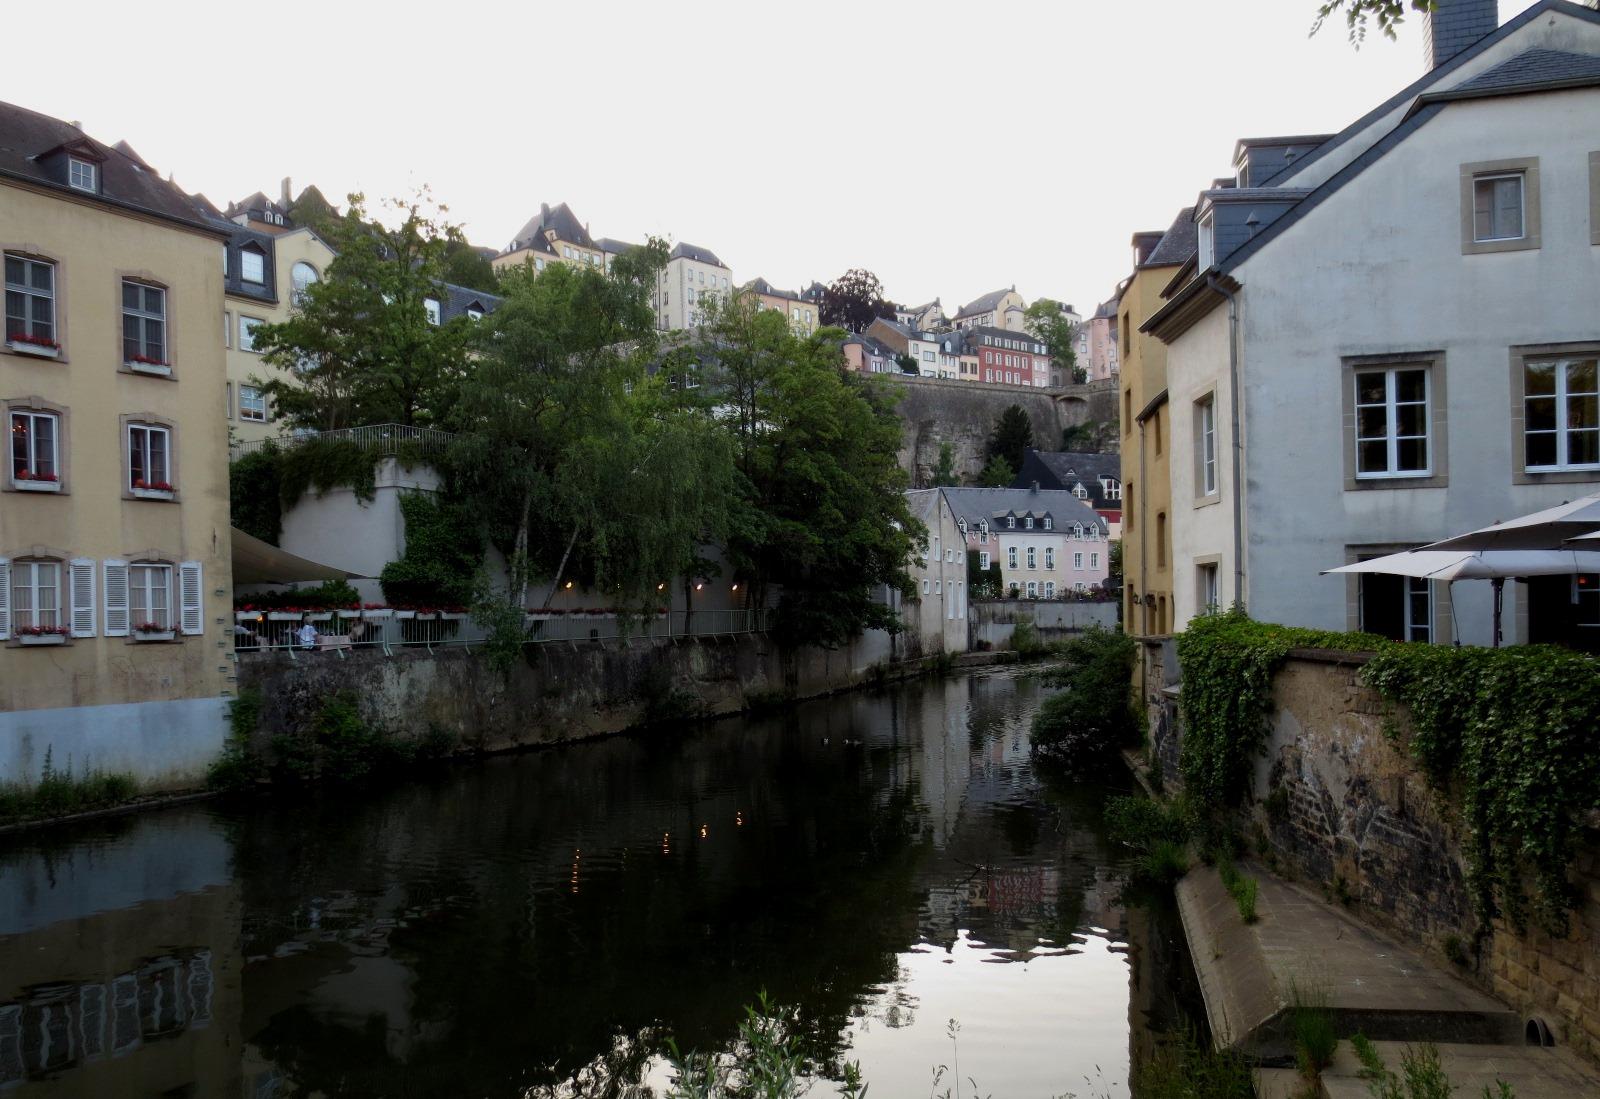 luxemburg-europe-travelgrip- (13) - Copy